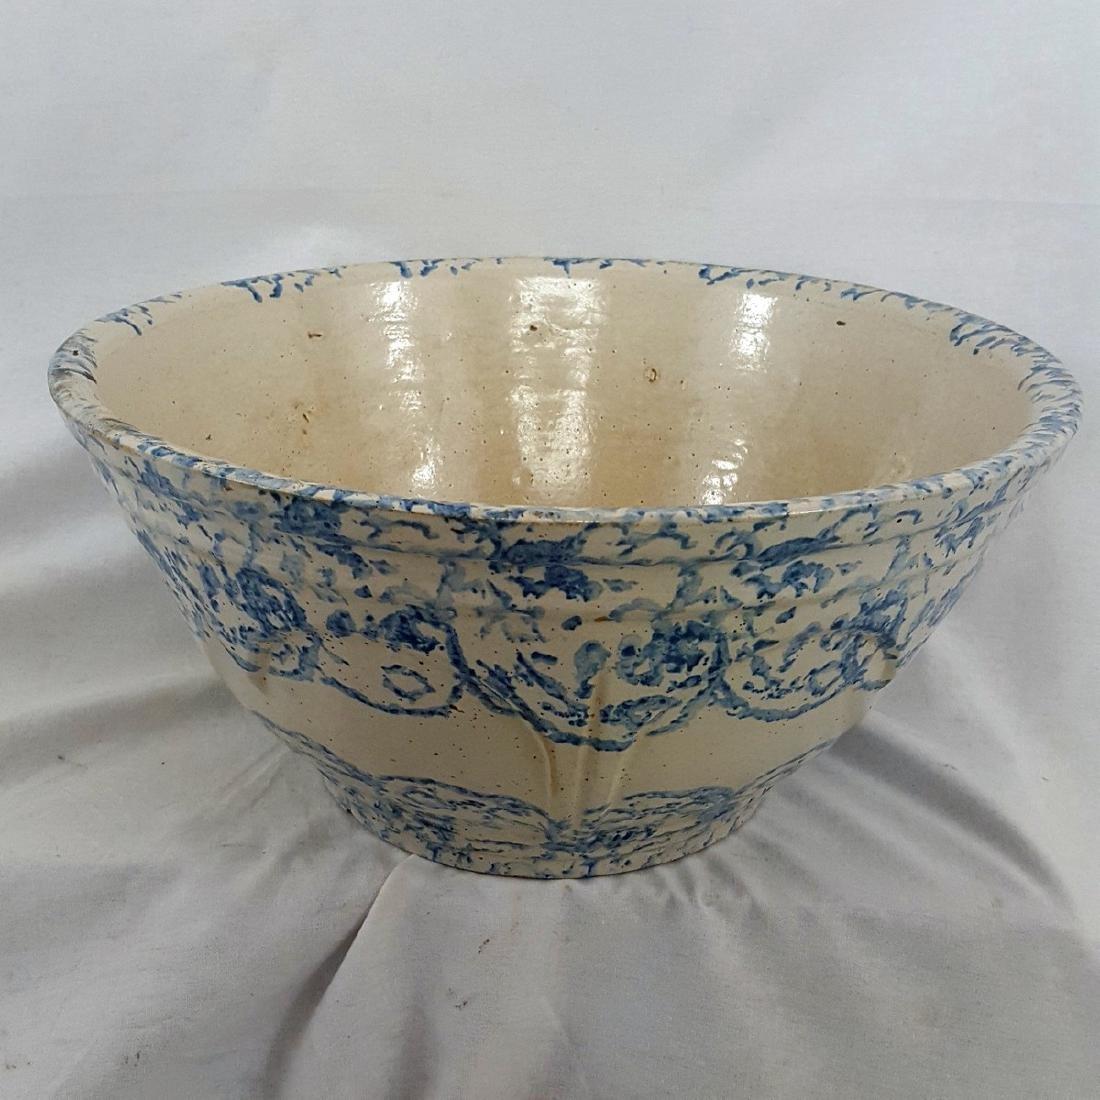 Very Large Blue Spongeware Bowl Ca 1880-1900